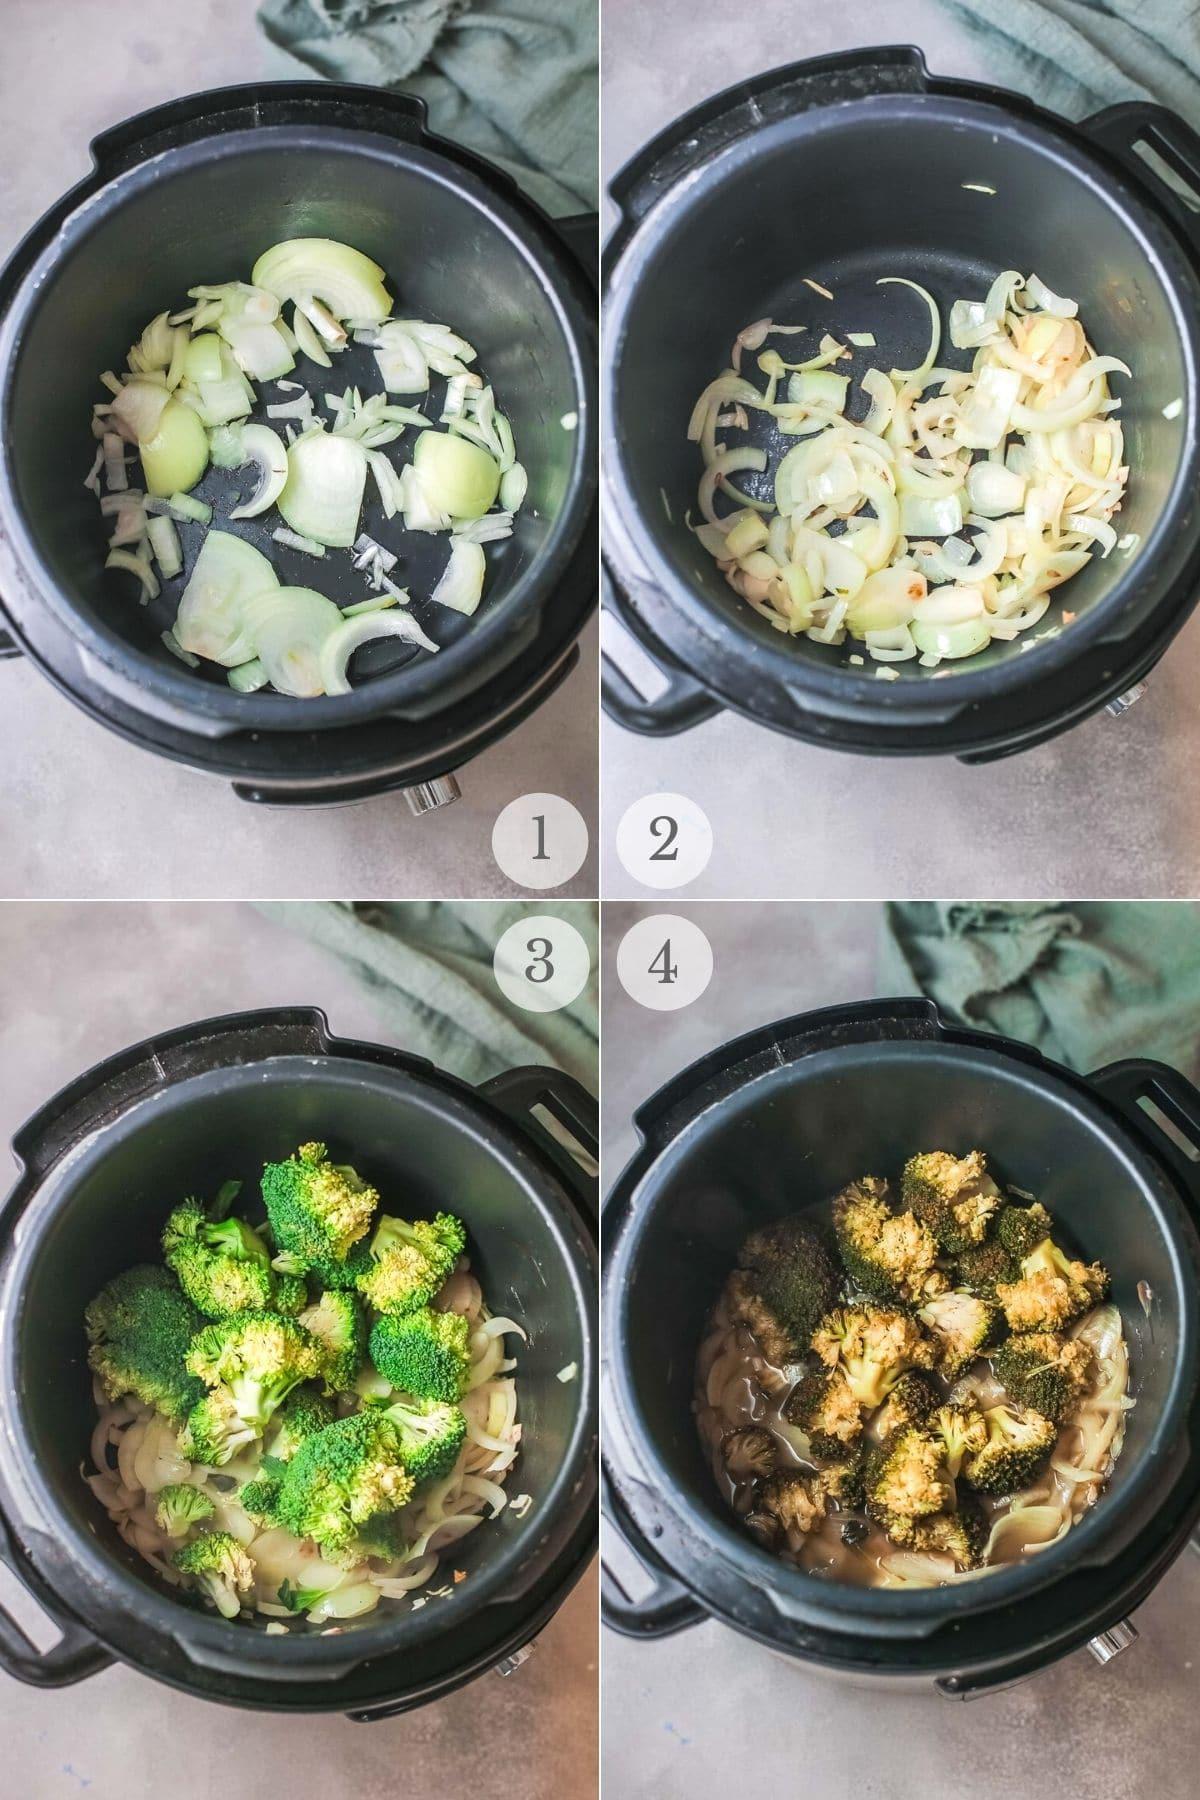 broccoli cheese soup recipe steps 1-4